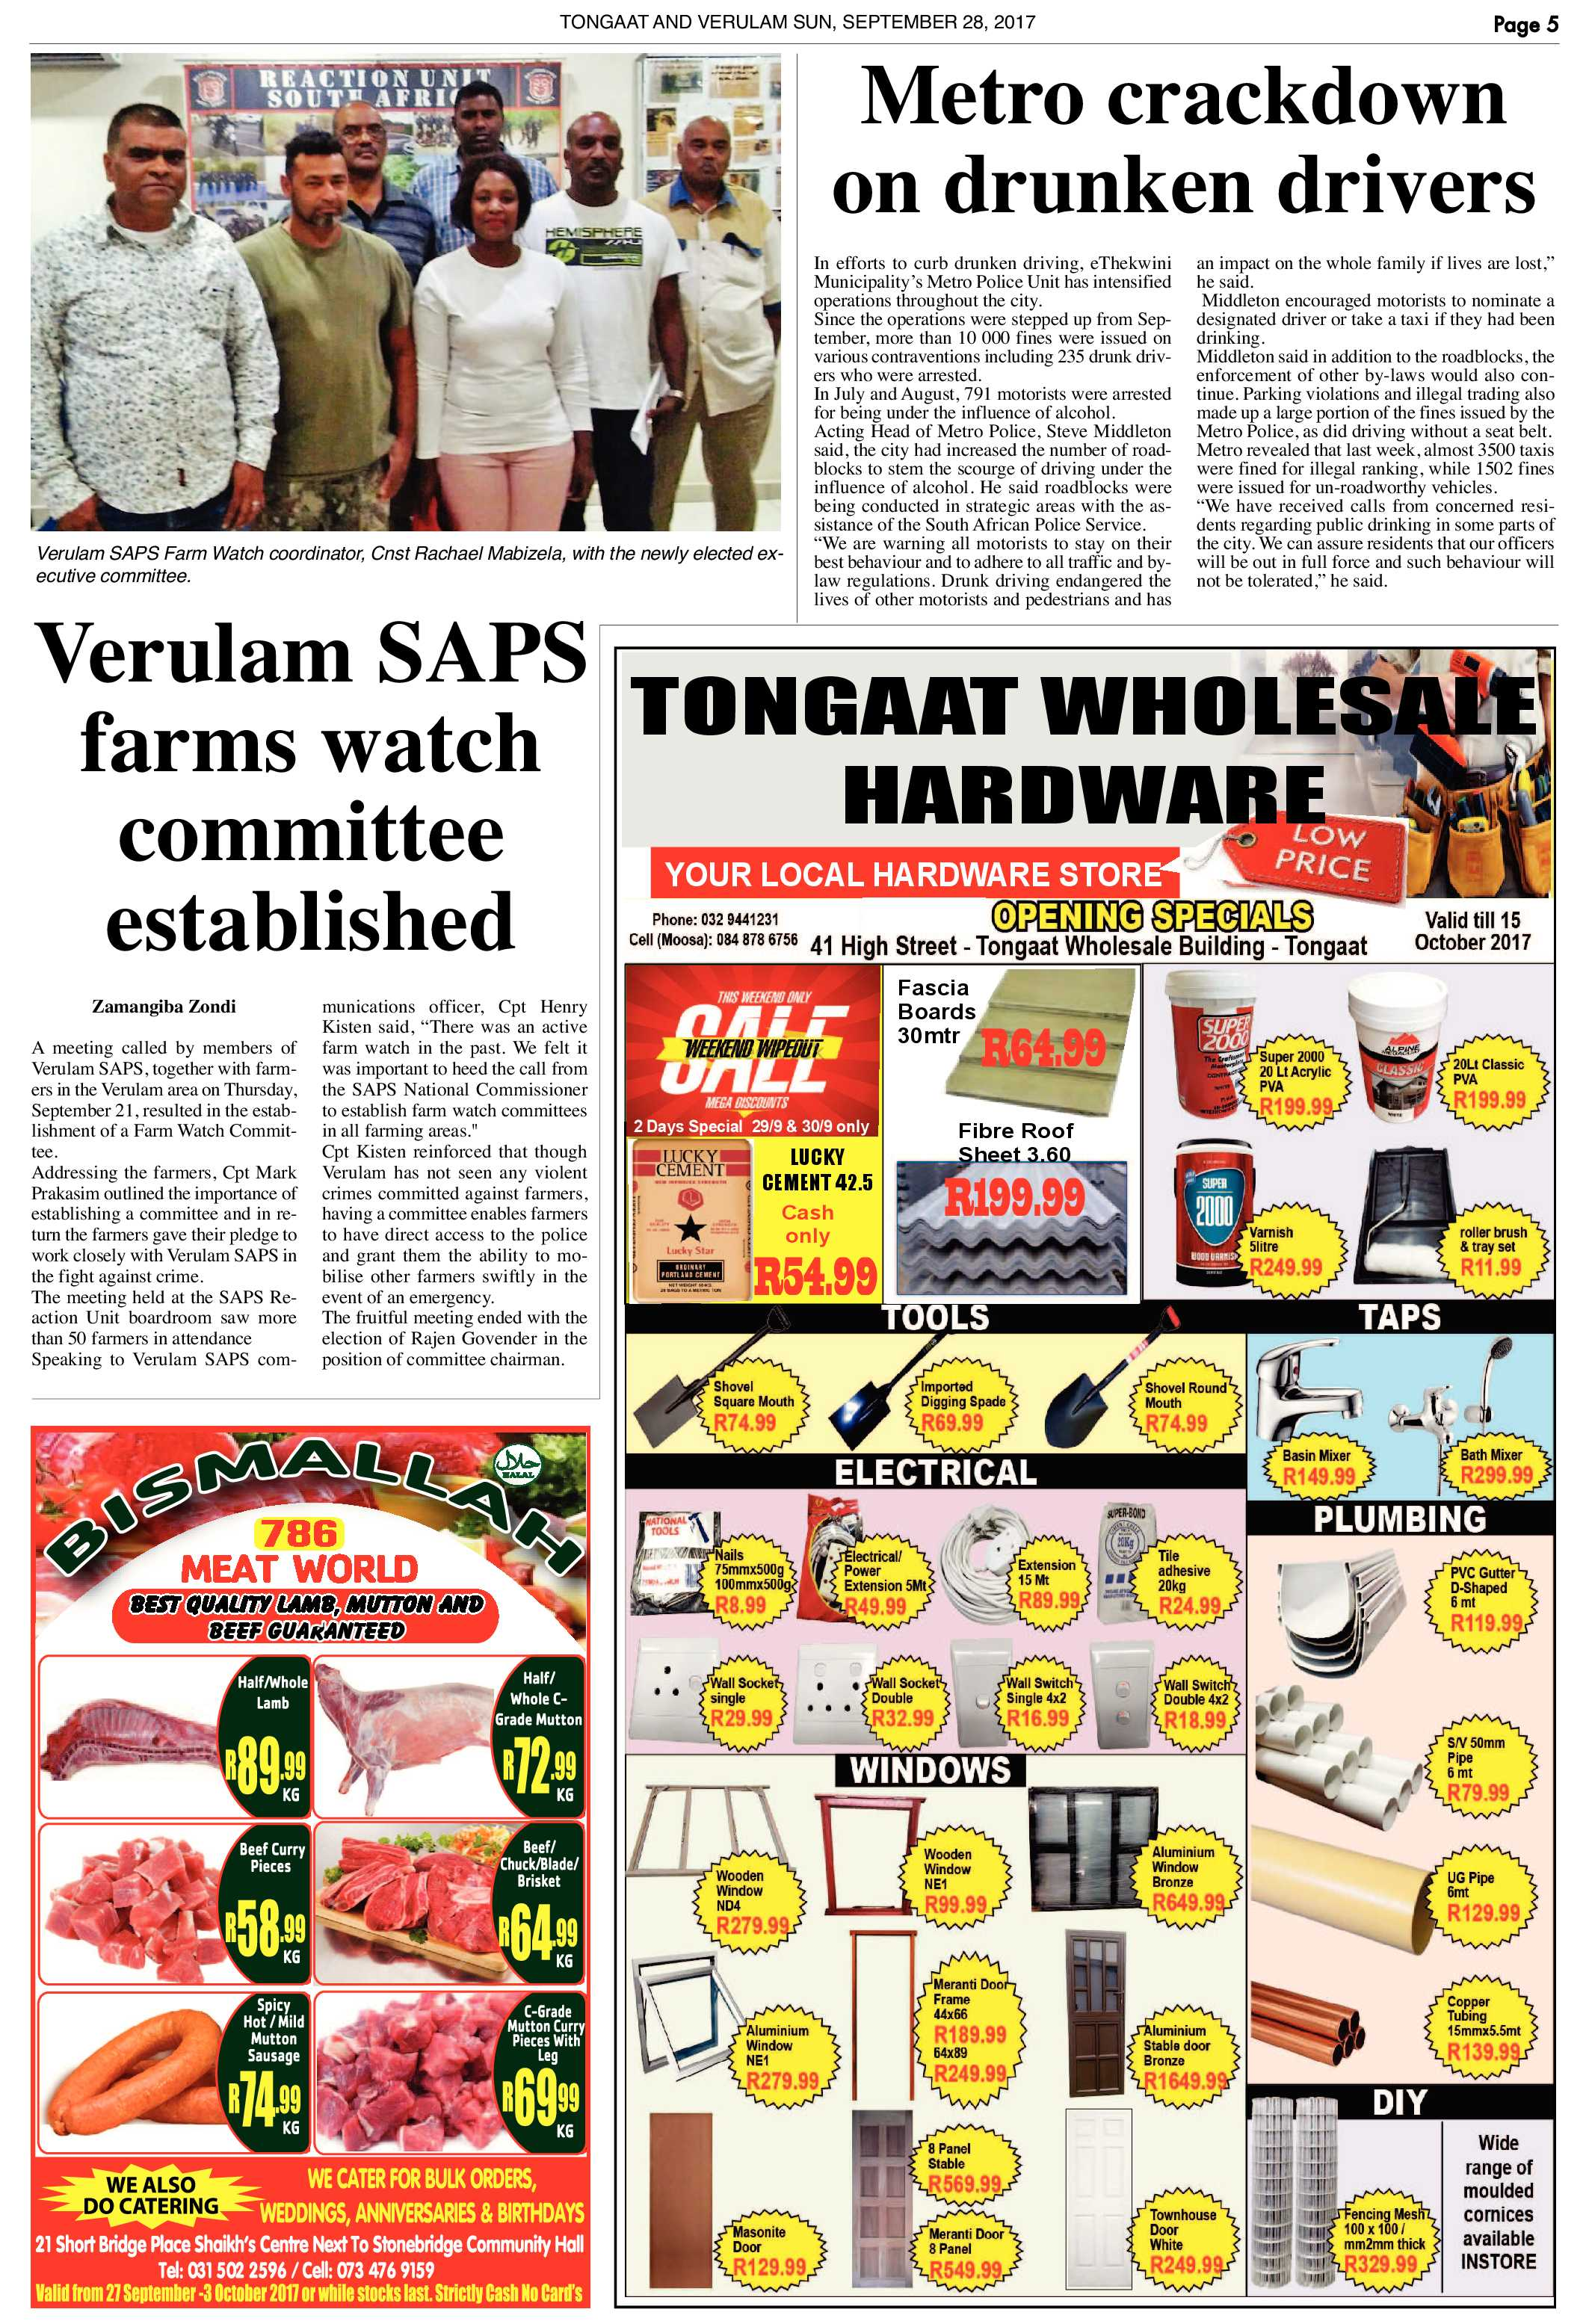 tongaat-verulam-sun-september-28-epapers-page-5